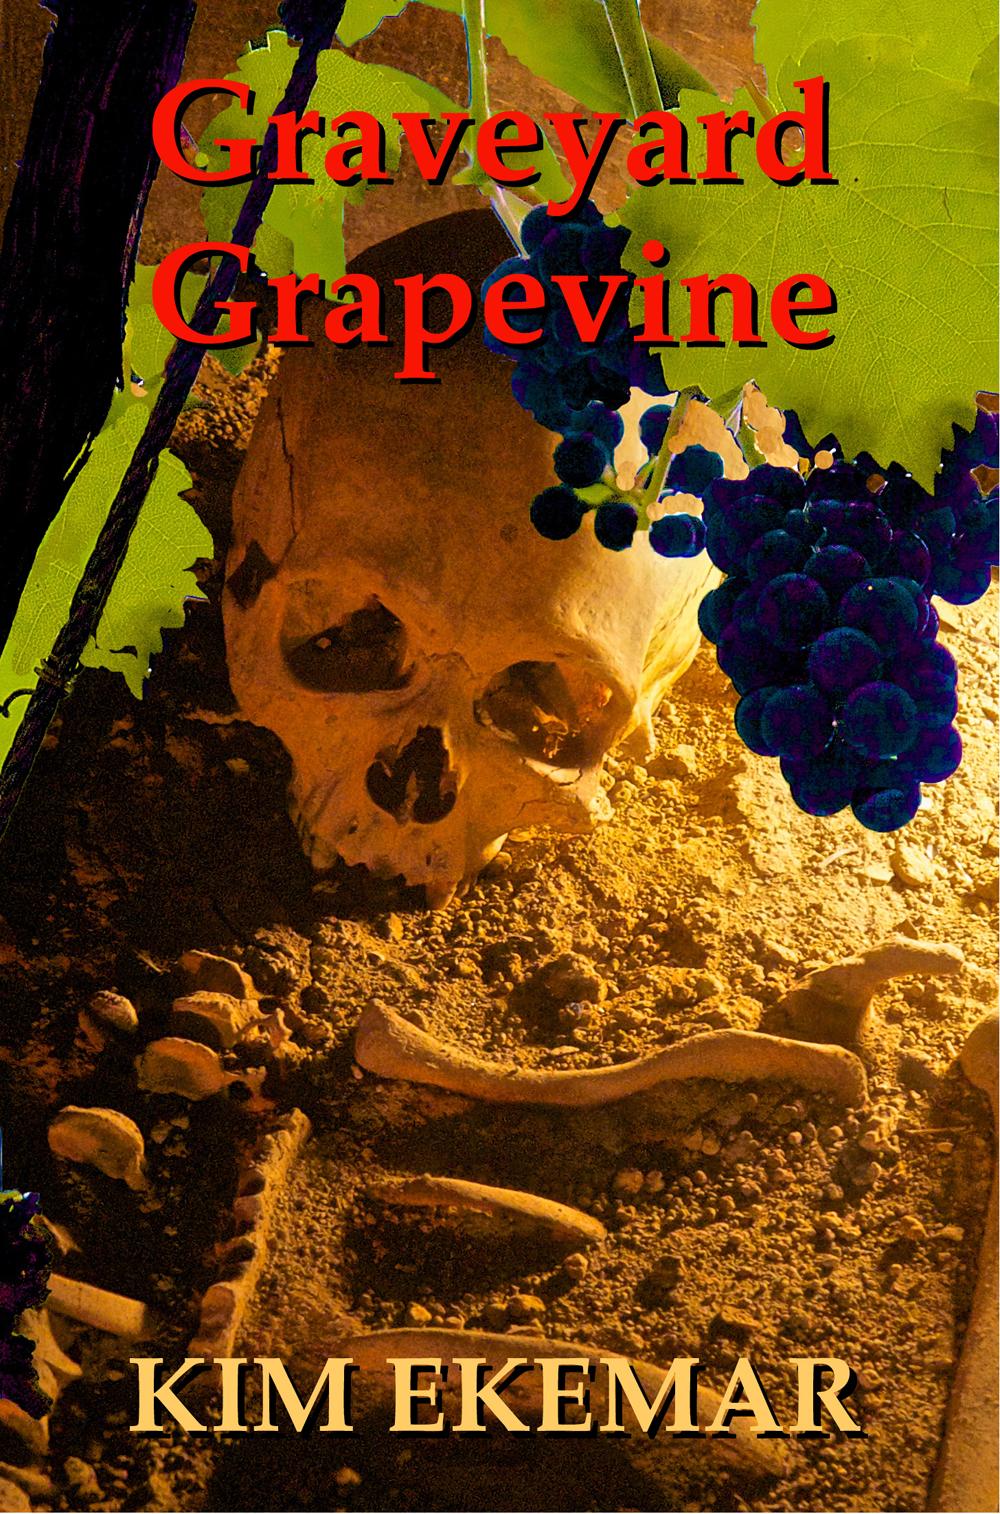 Graveyard Grapevine